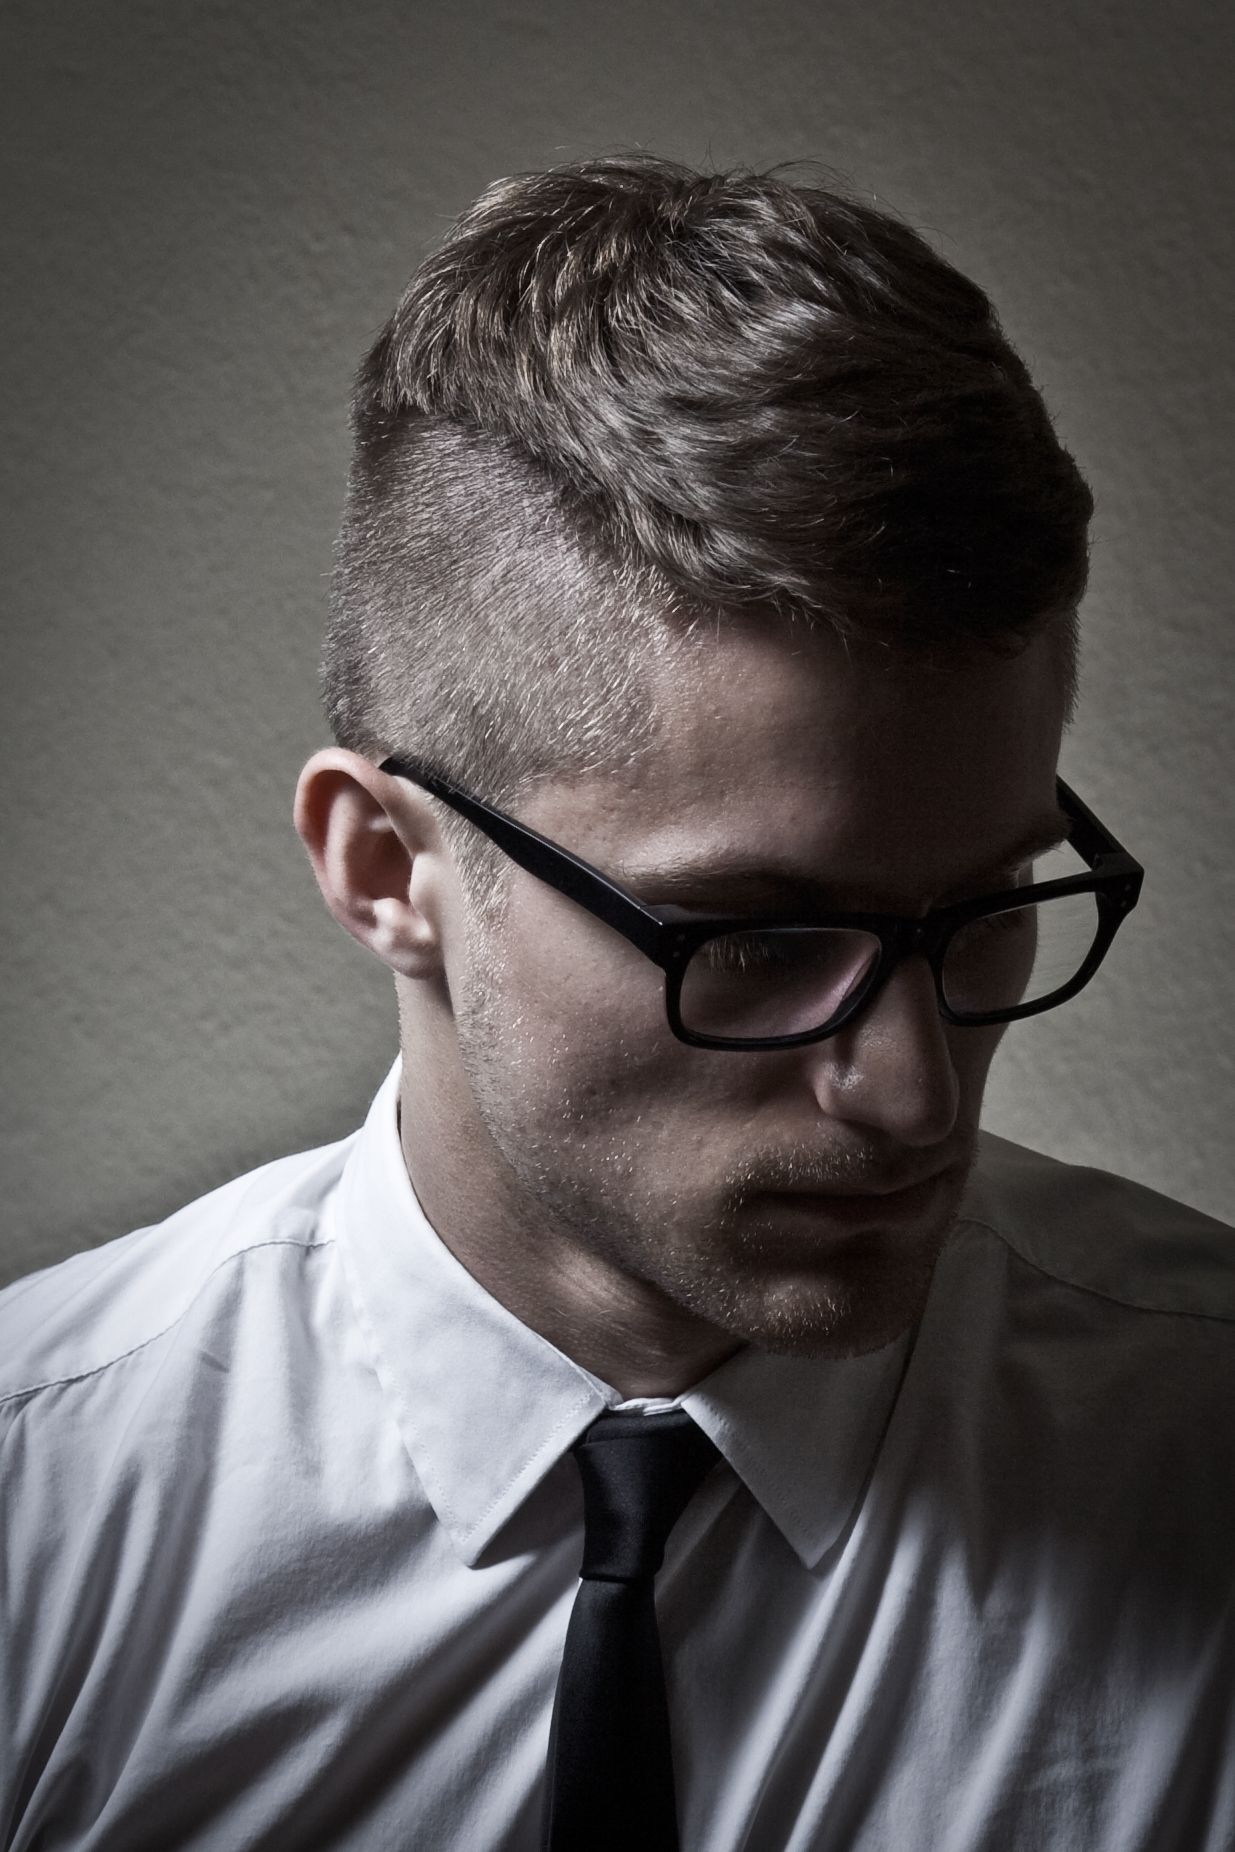 Mens haircuts undercut mens hairstyle  moda  pinterest  haircuts undercut and hair style